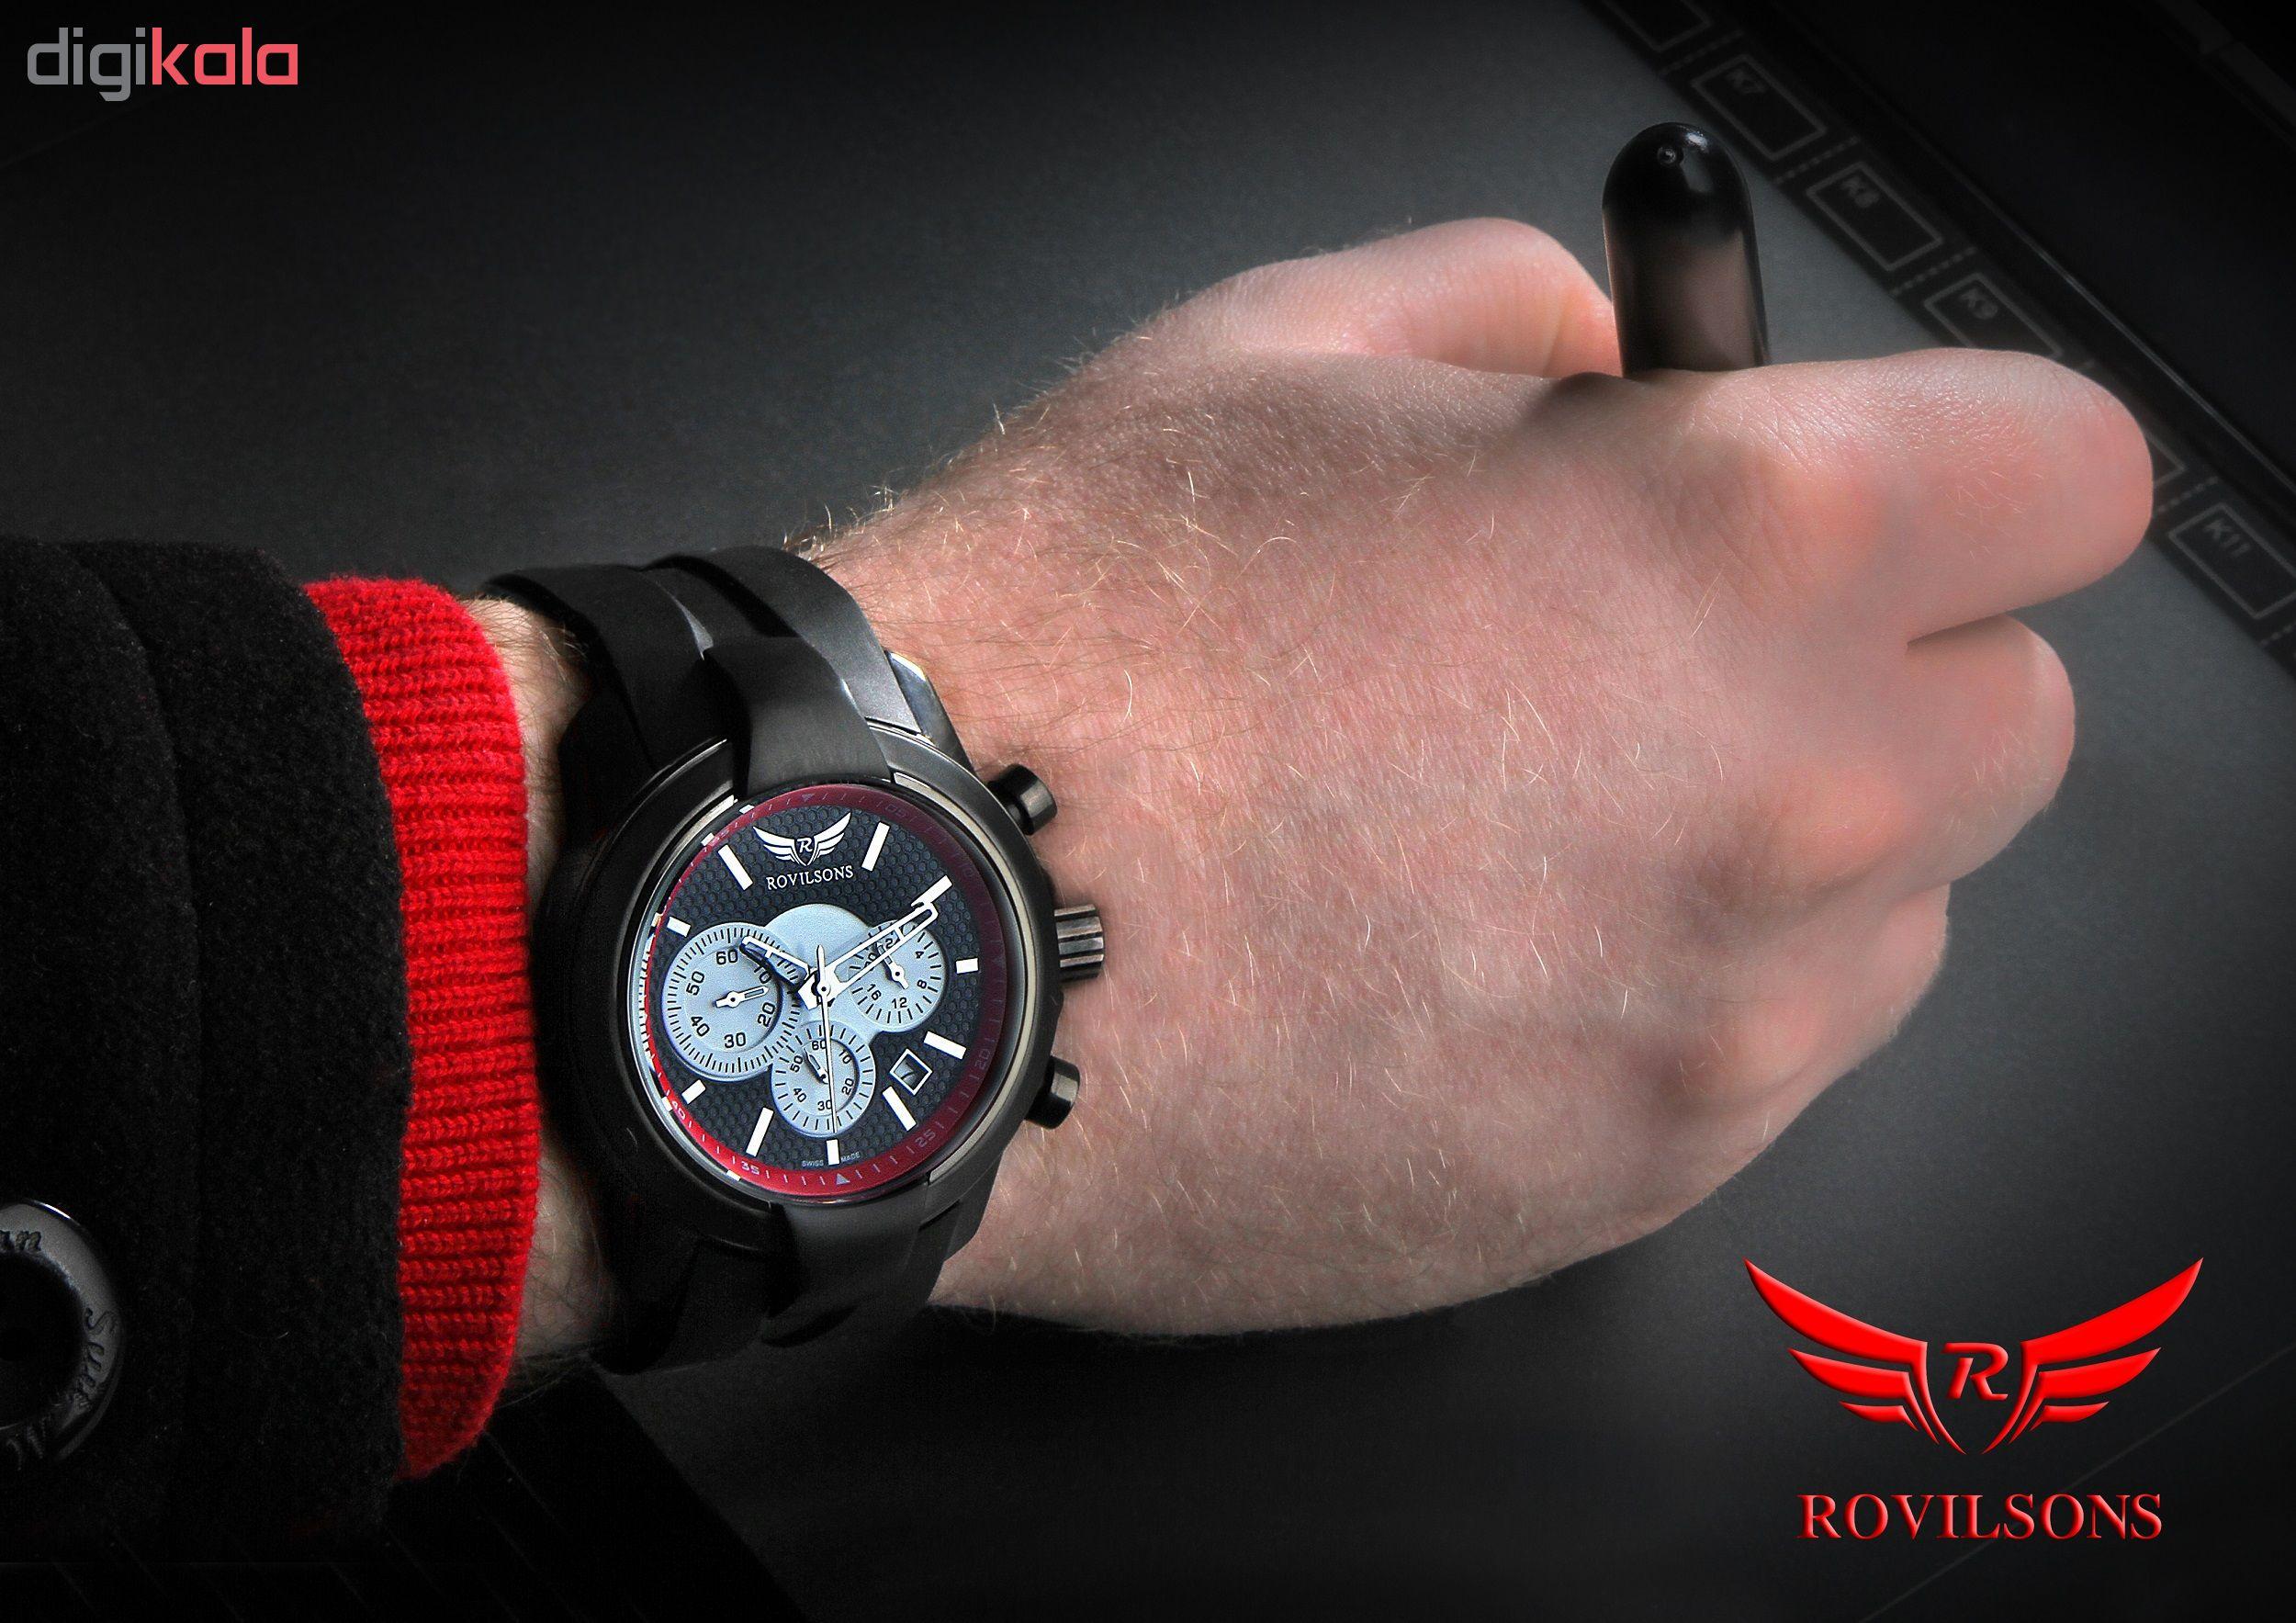 ساعت مچی عقربه ای مردانه راویلسون کد RW-015G-1